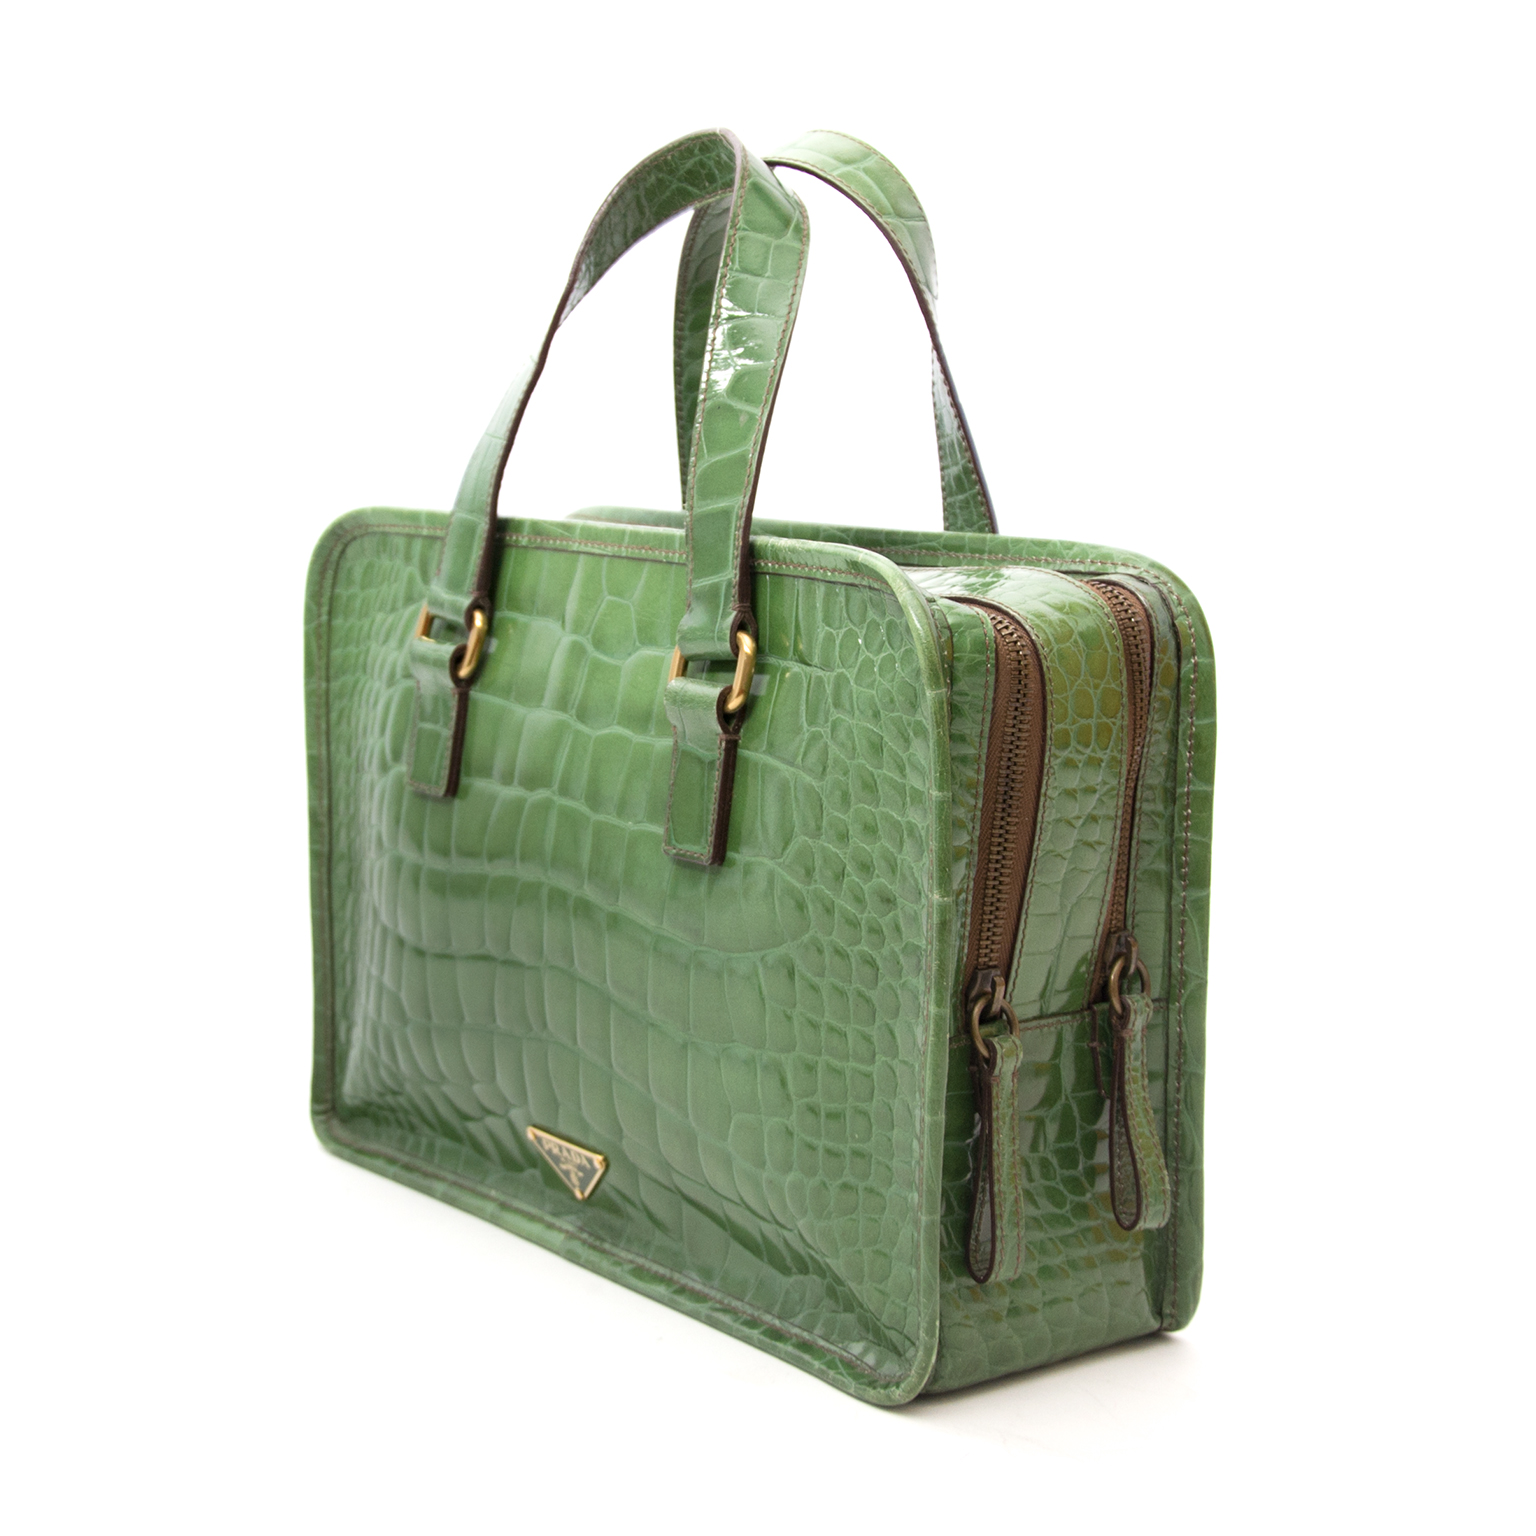 b3e35d97b74e ... Bag now online at Prada Groene Lederen St. Coco Bauletto Handtas met  Crocoreliëf nu online op labellov.com